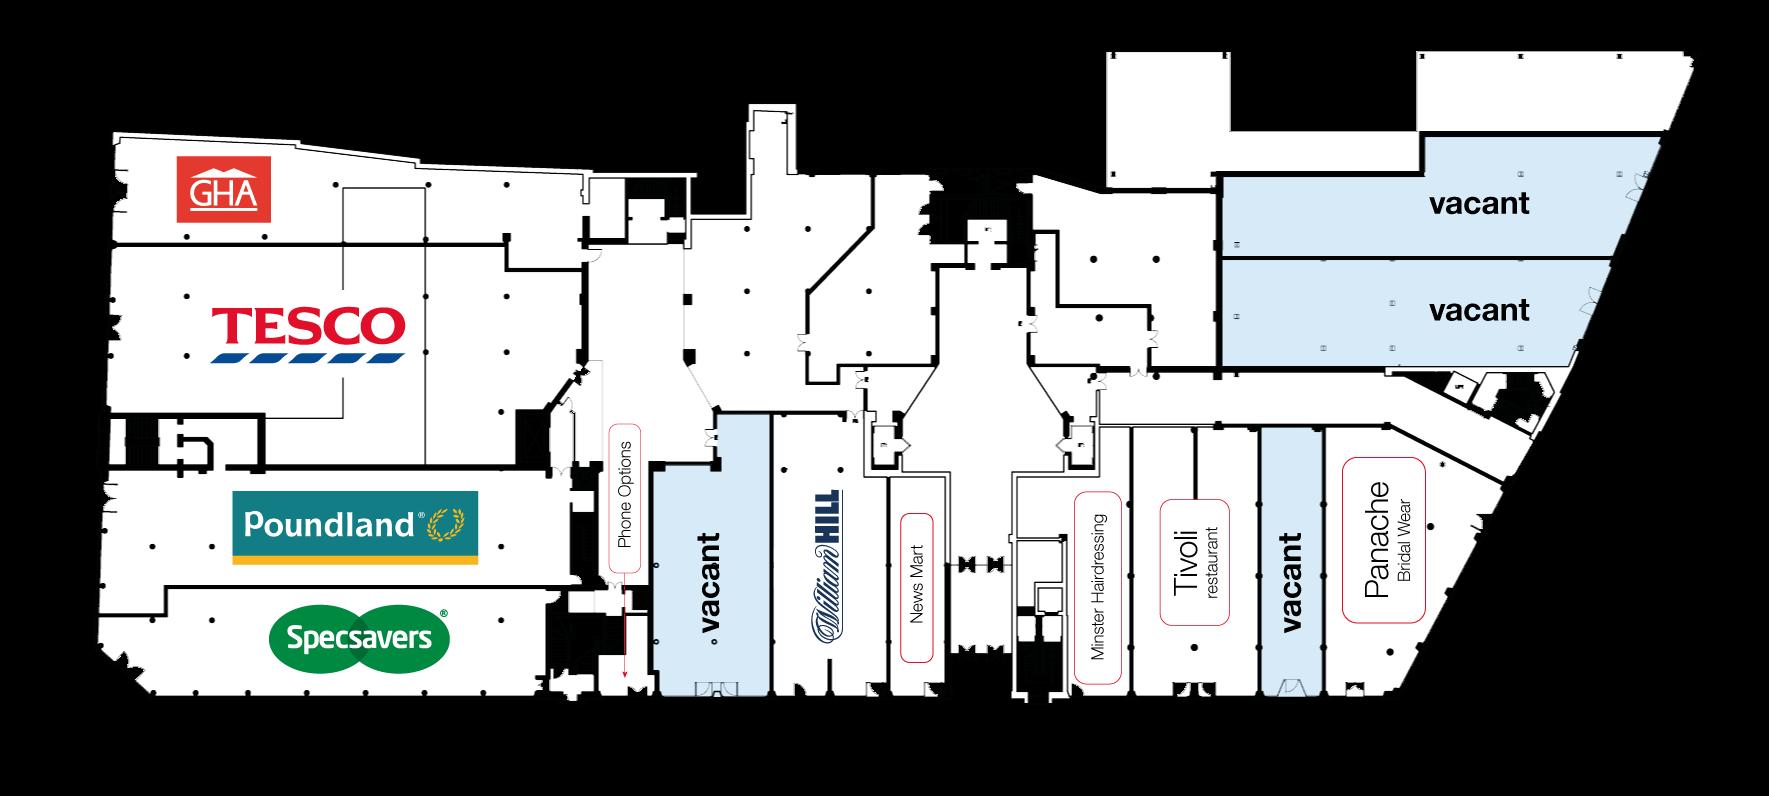 Ground floor rey